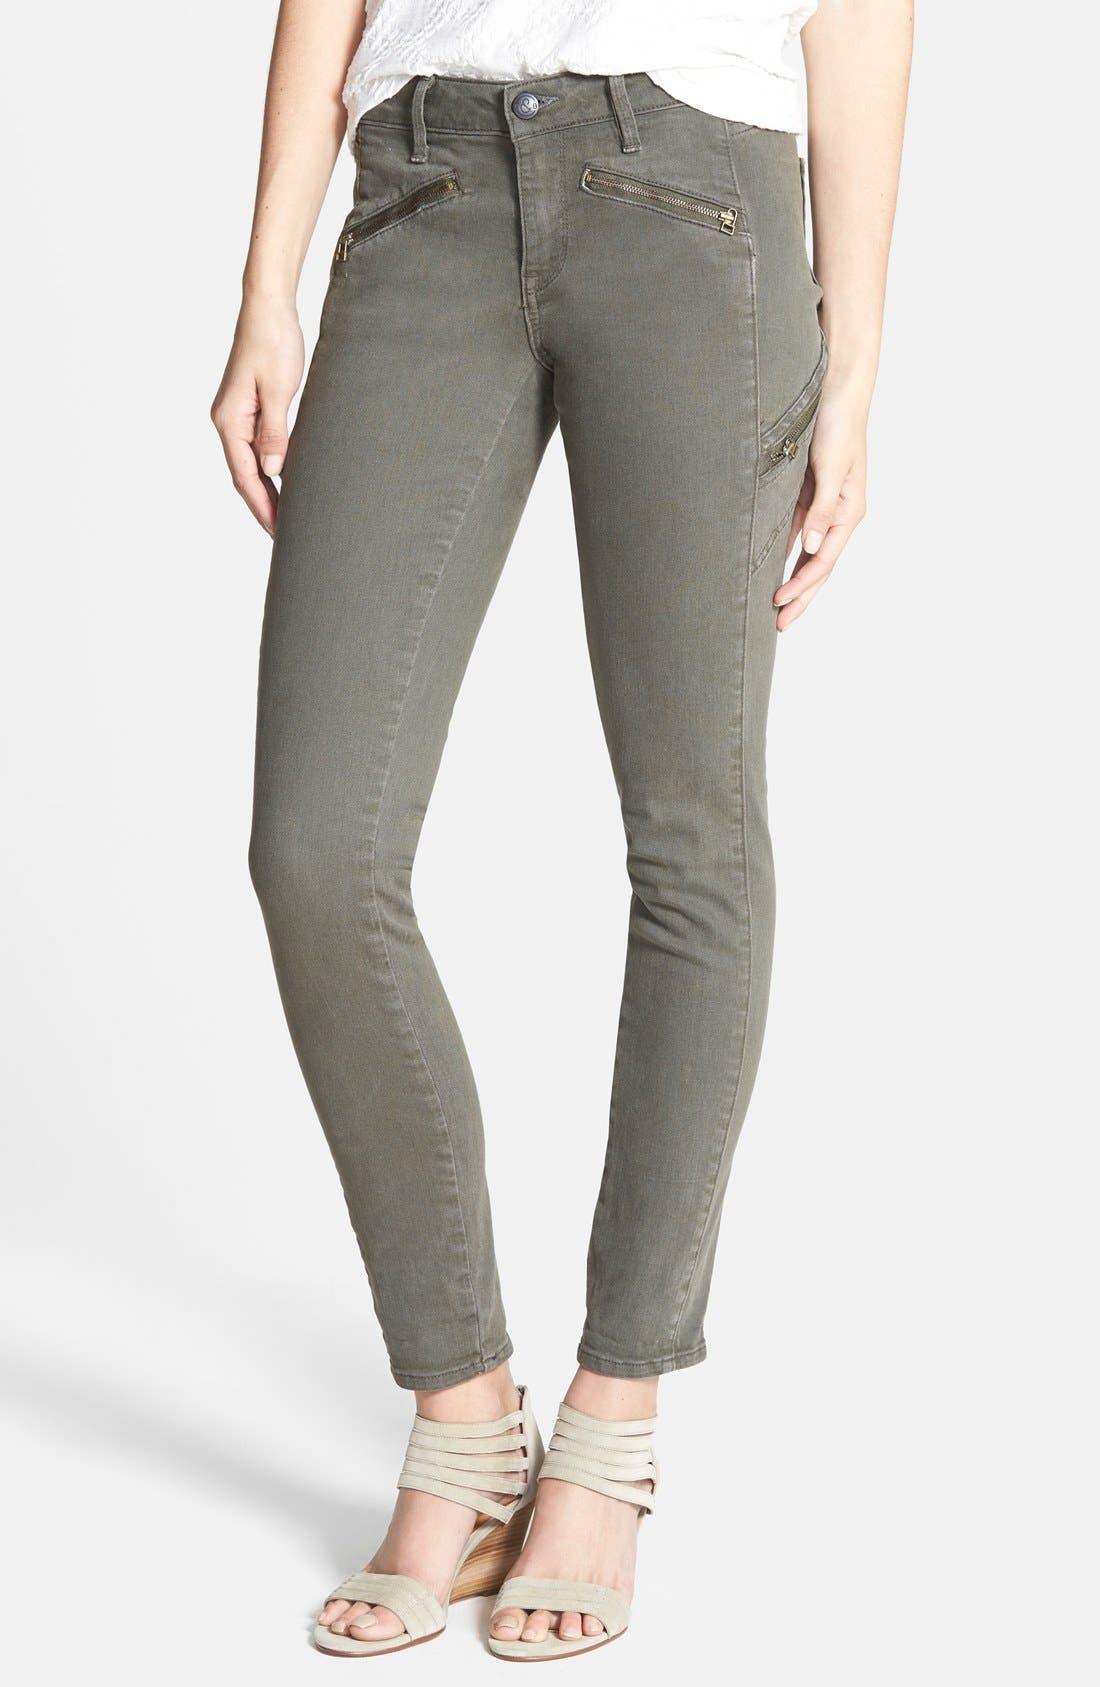 Alternate Image 1 Selected - Treasure&Bond Zip Skinny Jeans (Olive Tarmac)